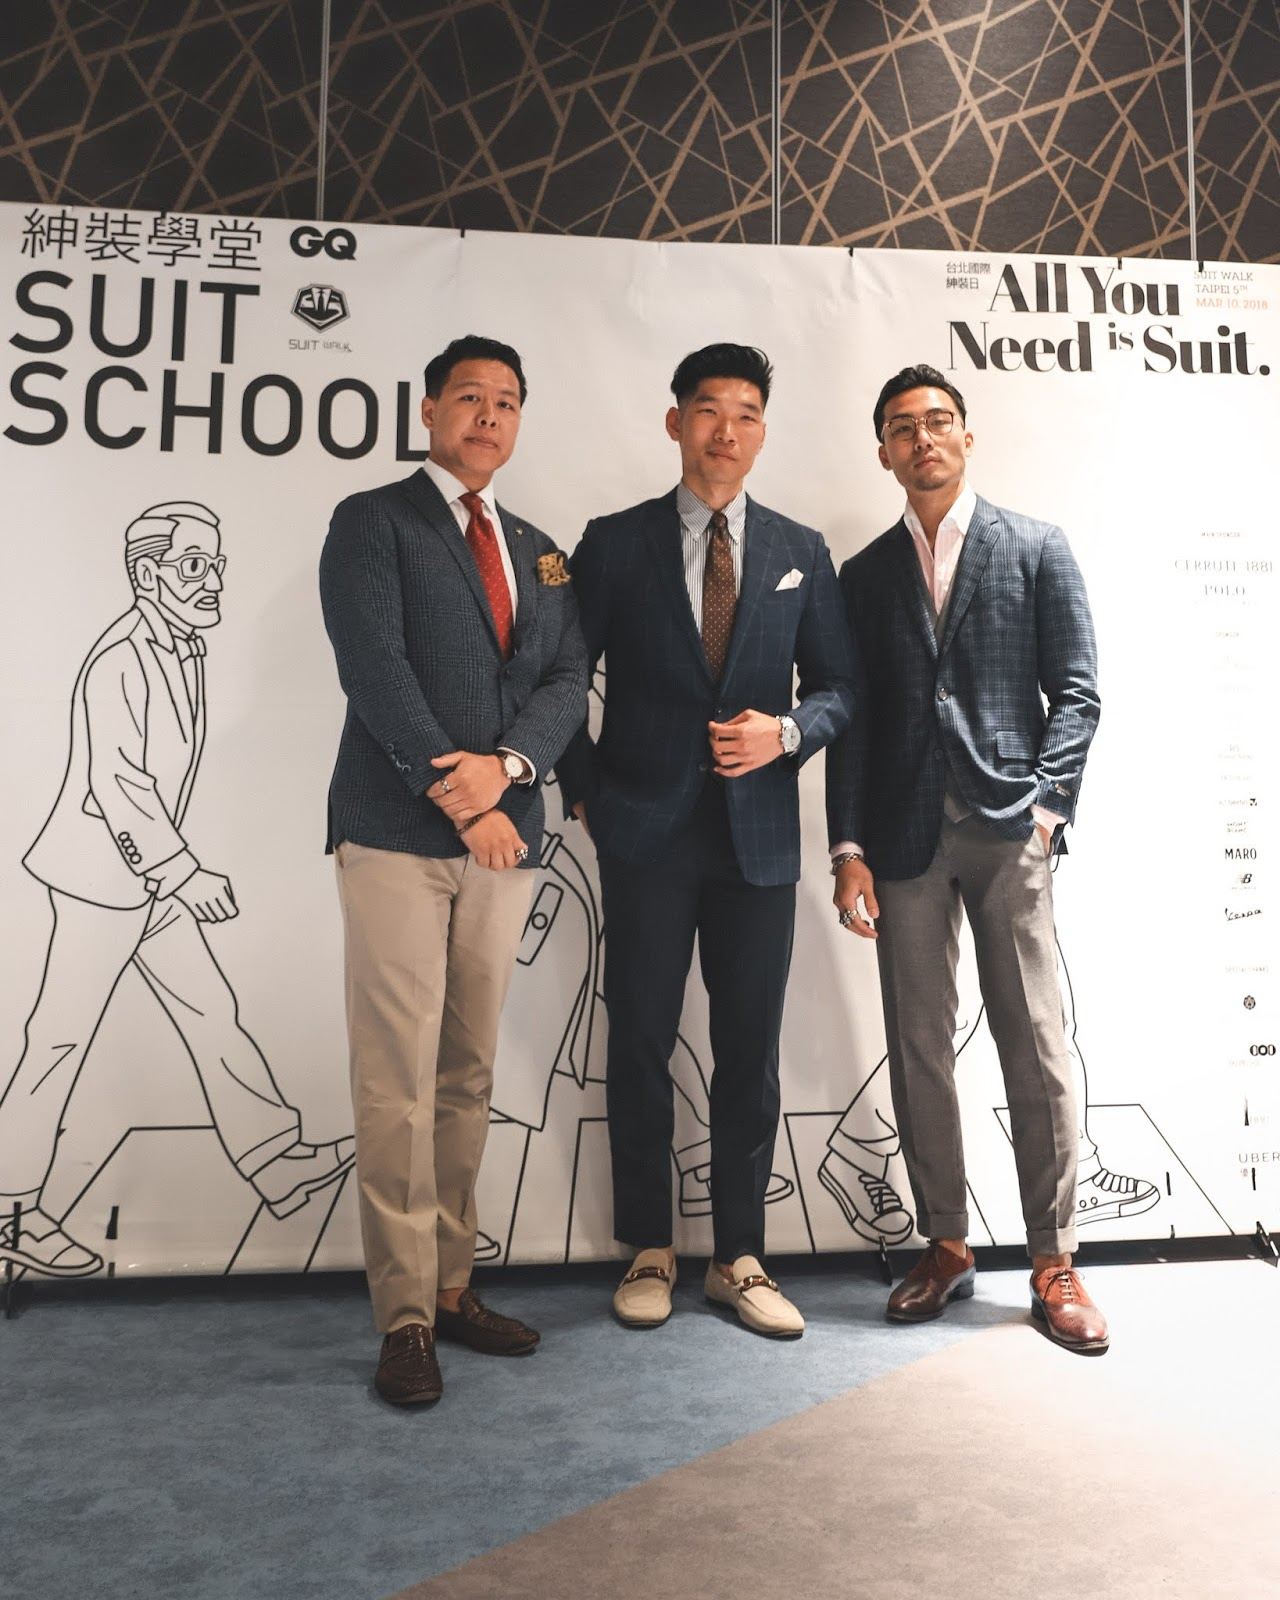 Leo Chan teaching GQ Taiwan Suit Walk Class with Lex Mr. Gumbatron, Kevin Wang